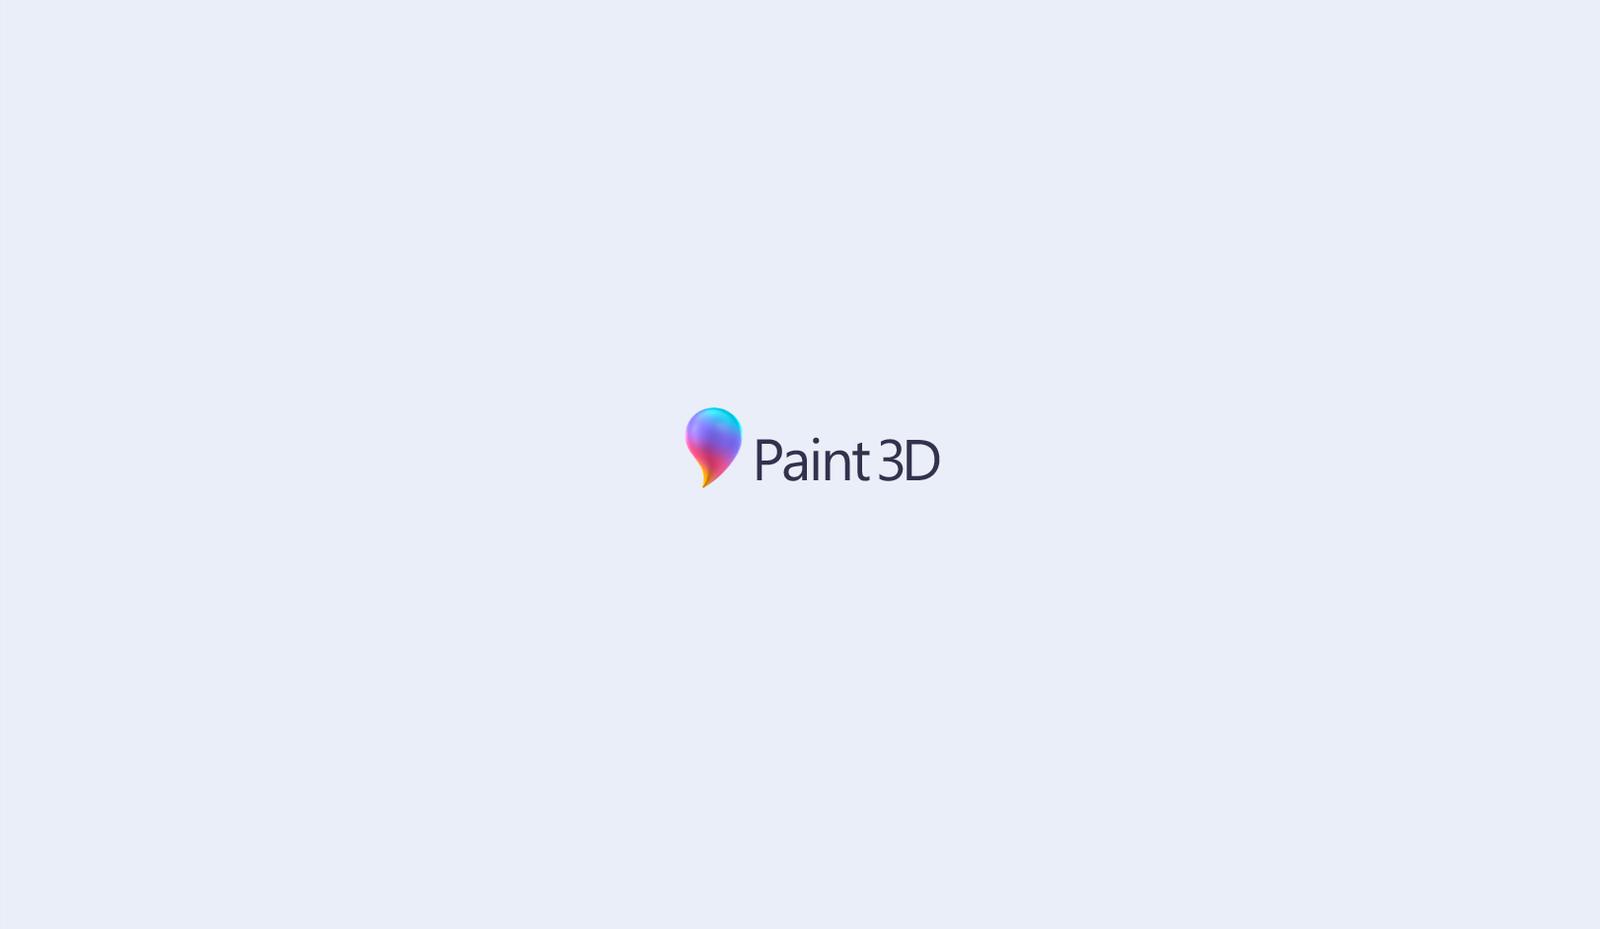 Paint3D(ペイント3D)